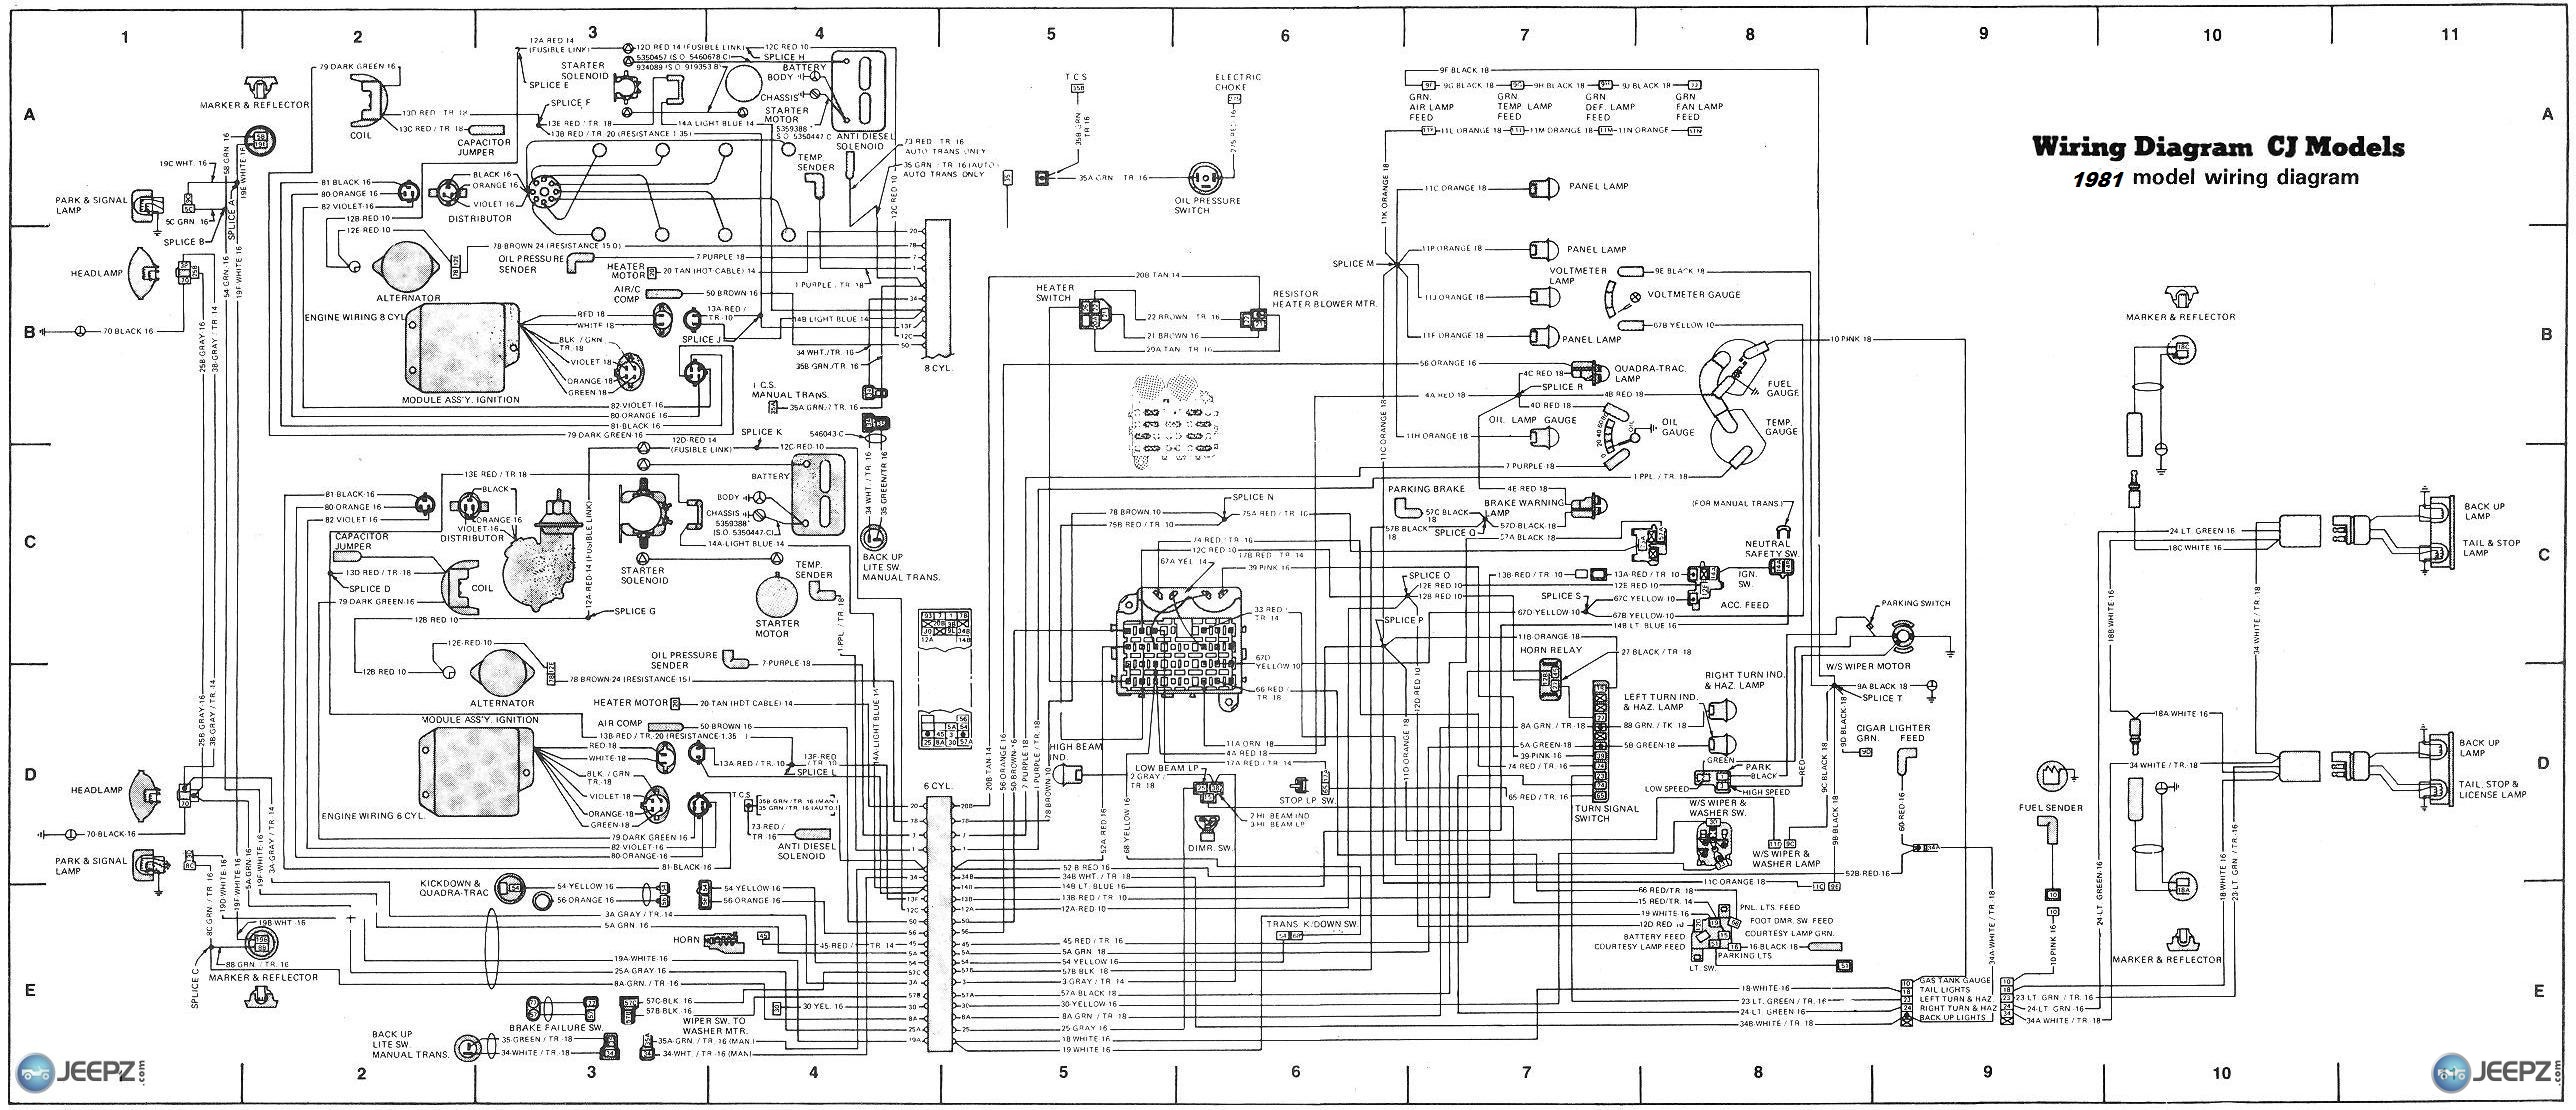 1983 Cj7 Dash Wiring - Wiring Diagram Dash  Cj Wiring Diagram Column on 79 cj7 carburetor, jeep wiring diagram, 79 cj7 radiator, 79 cj7 wheels, 79 cj7 seats, 79 cj7 parts, 1981 cj5 dash wiring diagram, 79 cj7 steering, 95 wrangler wiring diagram, 91 camaro rs wiring diagram,